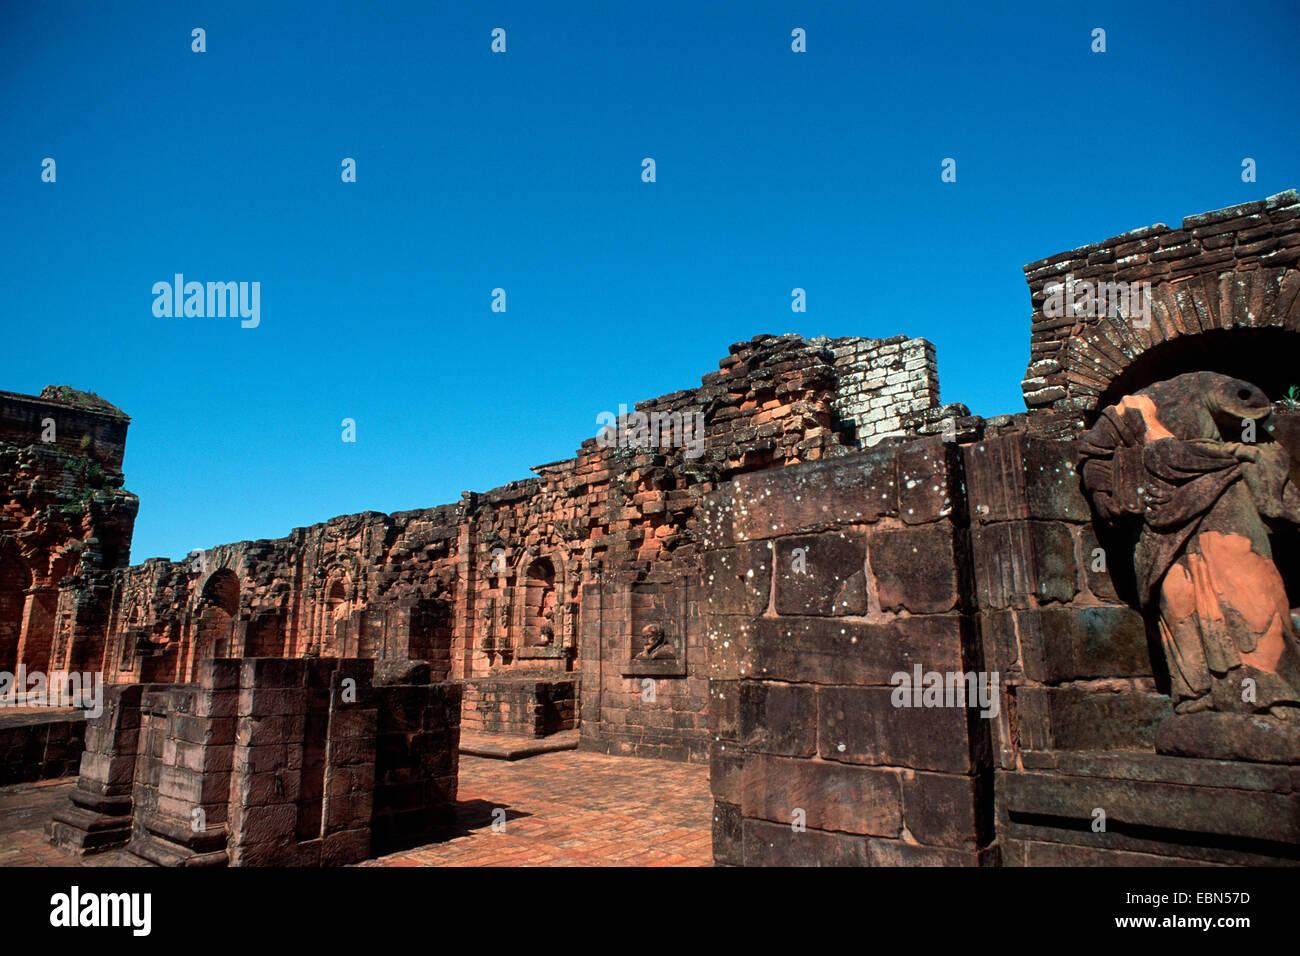 Iglesia Major, ruine, Paraguay, Trinidad - Stock Image